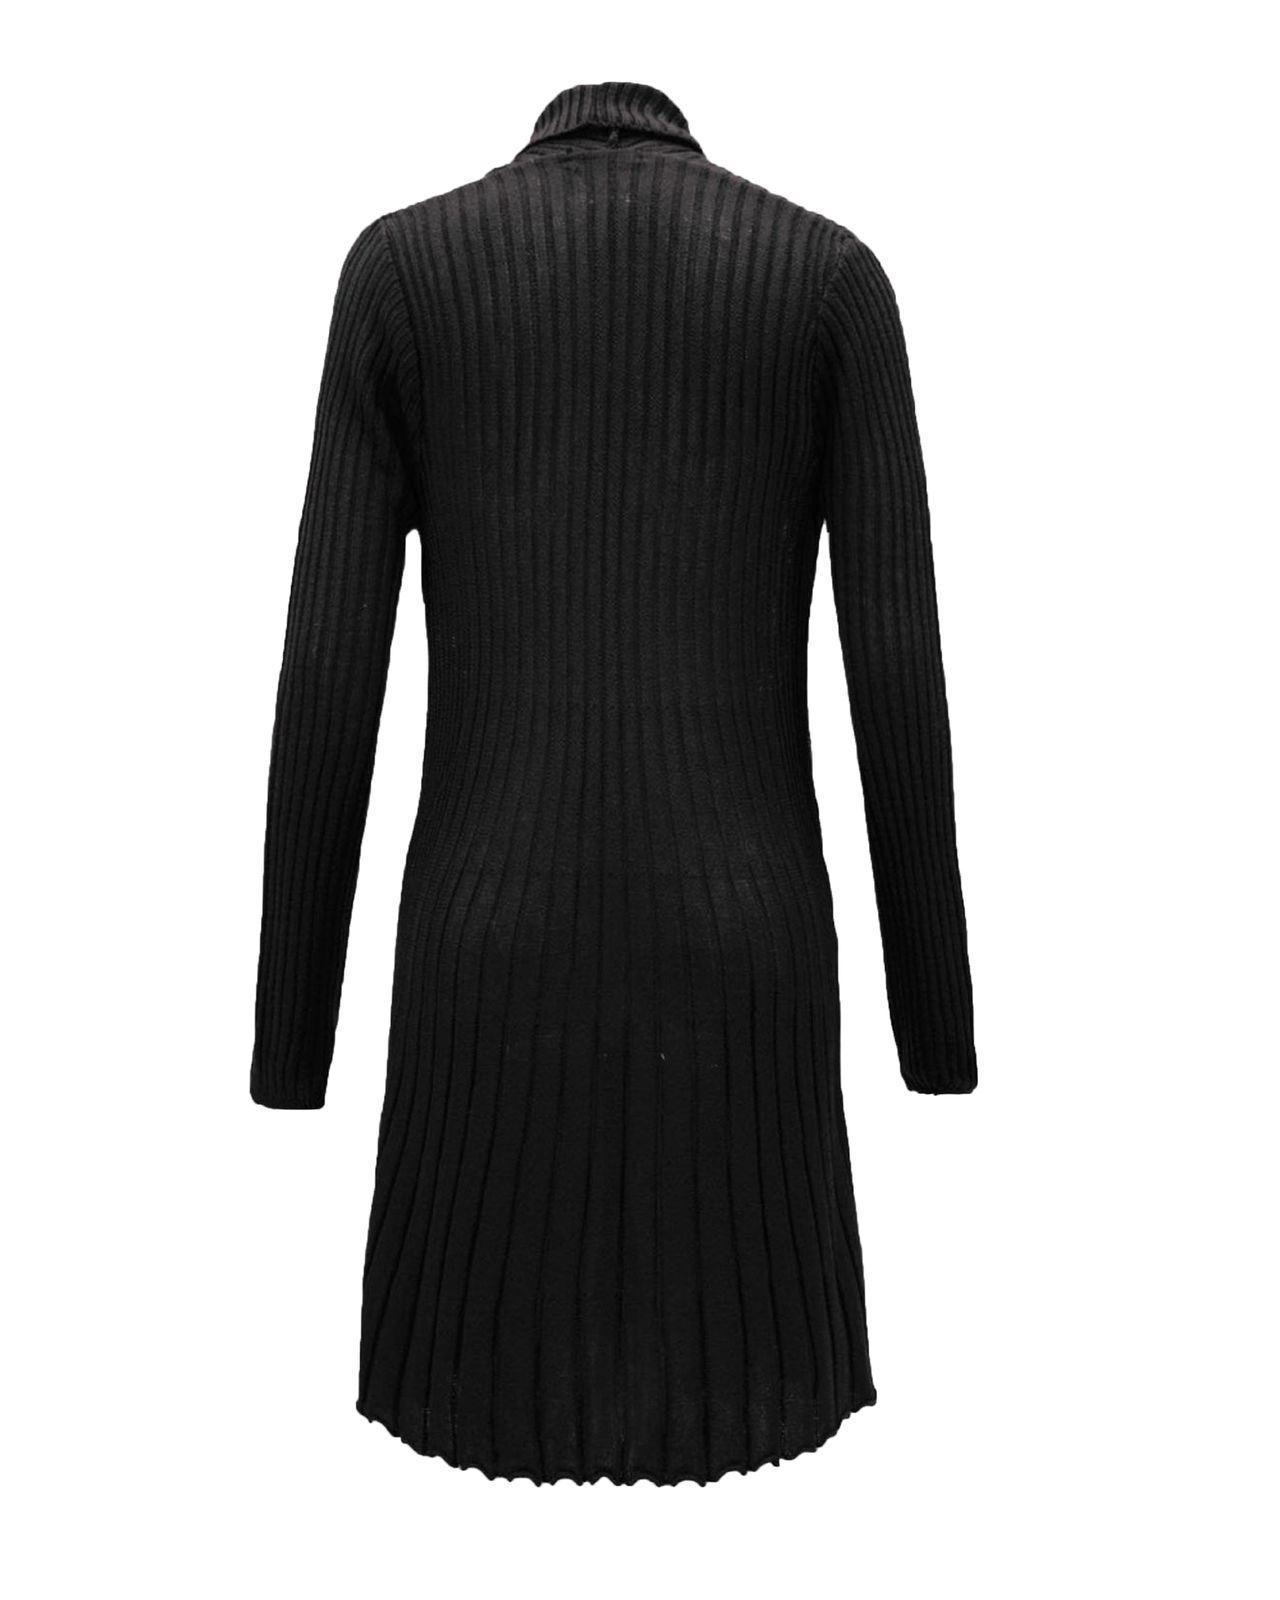 Ladies-Women-Knitted-Brooch-Boyfriend-Cardigan-Waterfall-Summer-Dress-Top-Jumper thumbnail 11